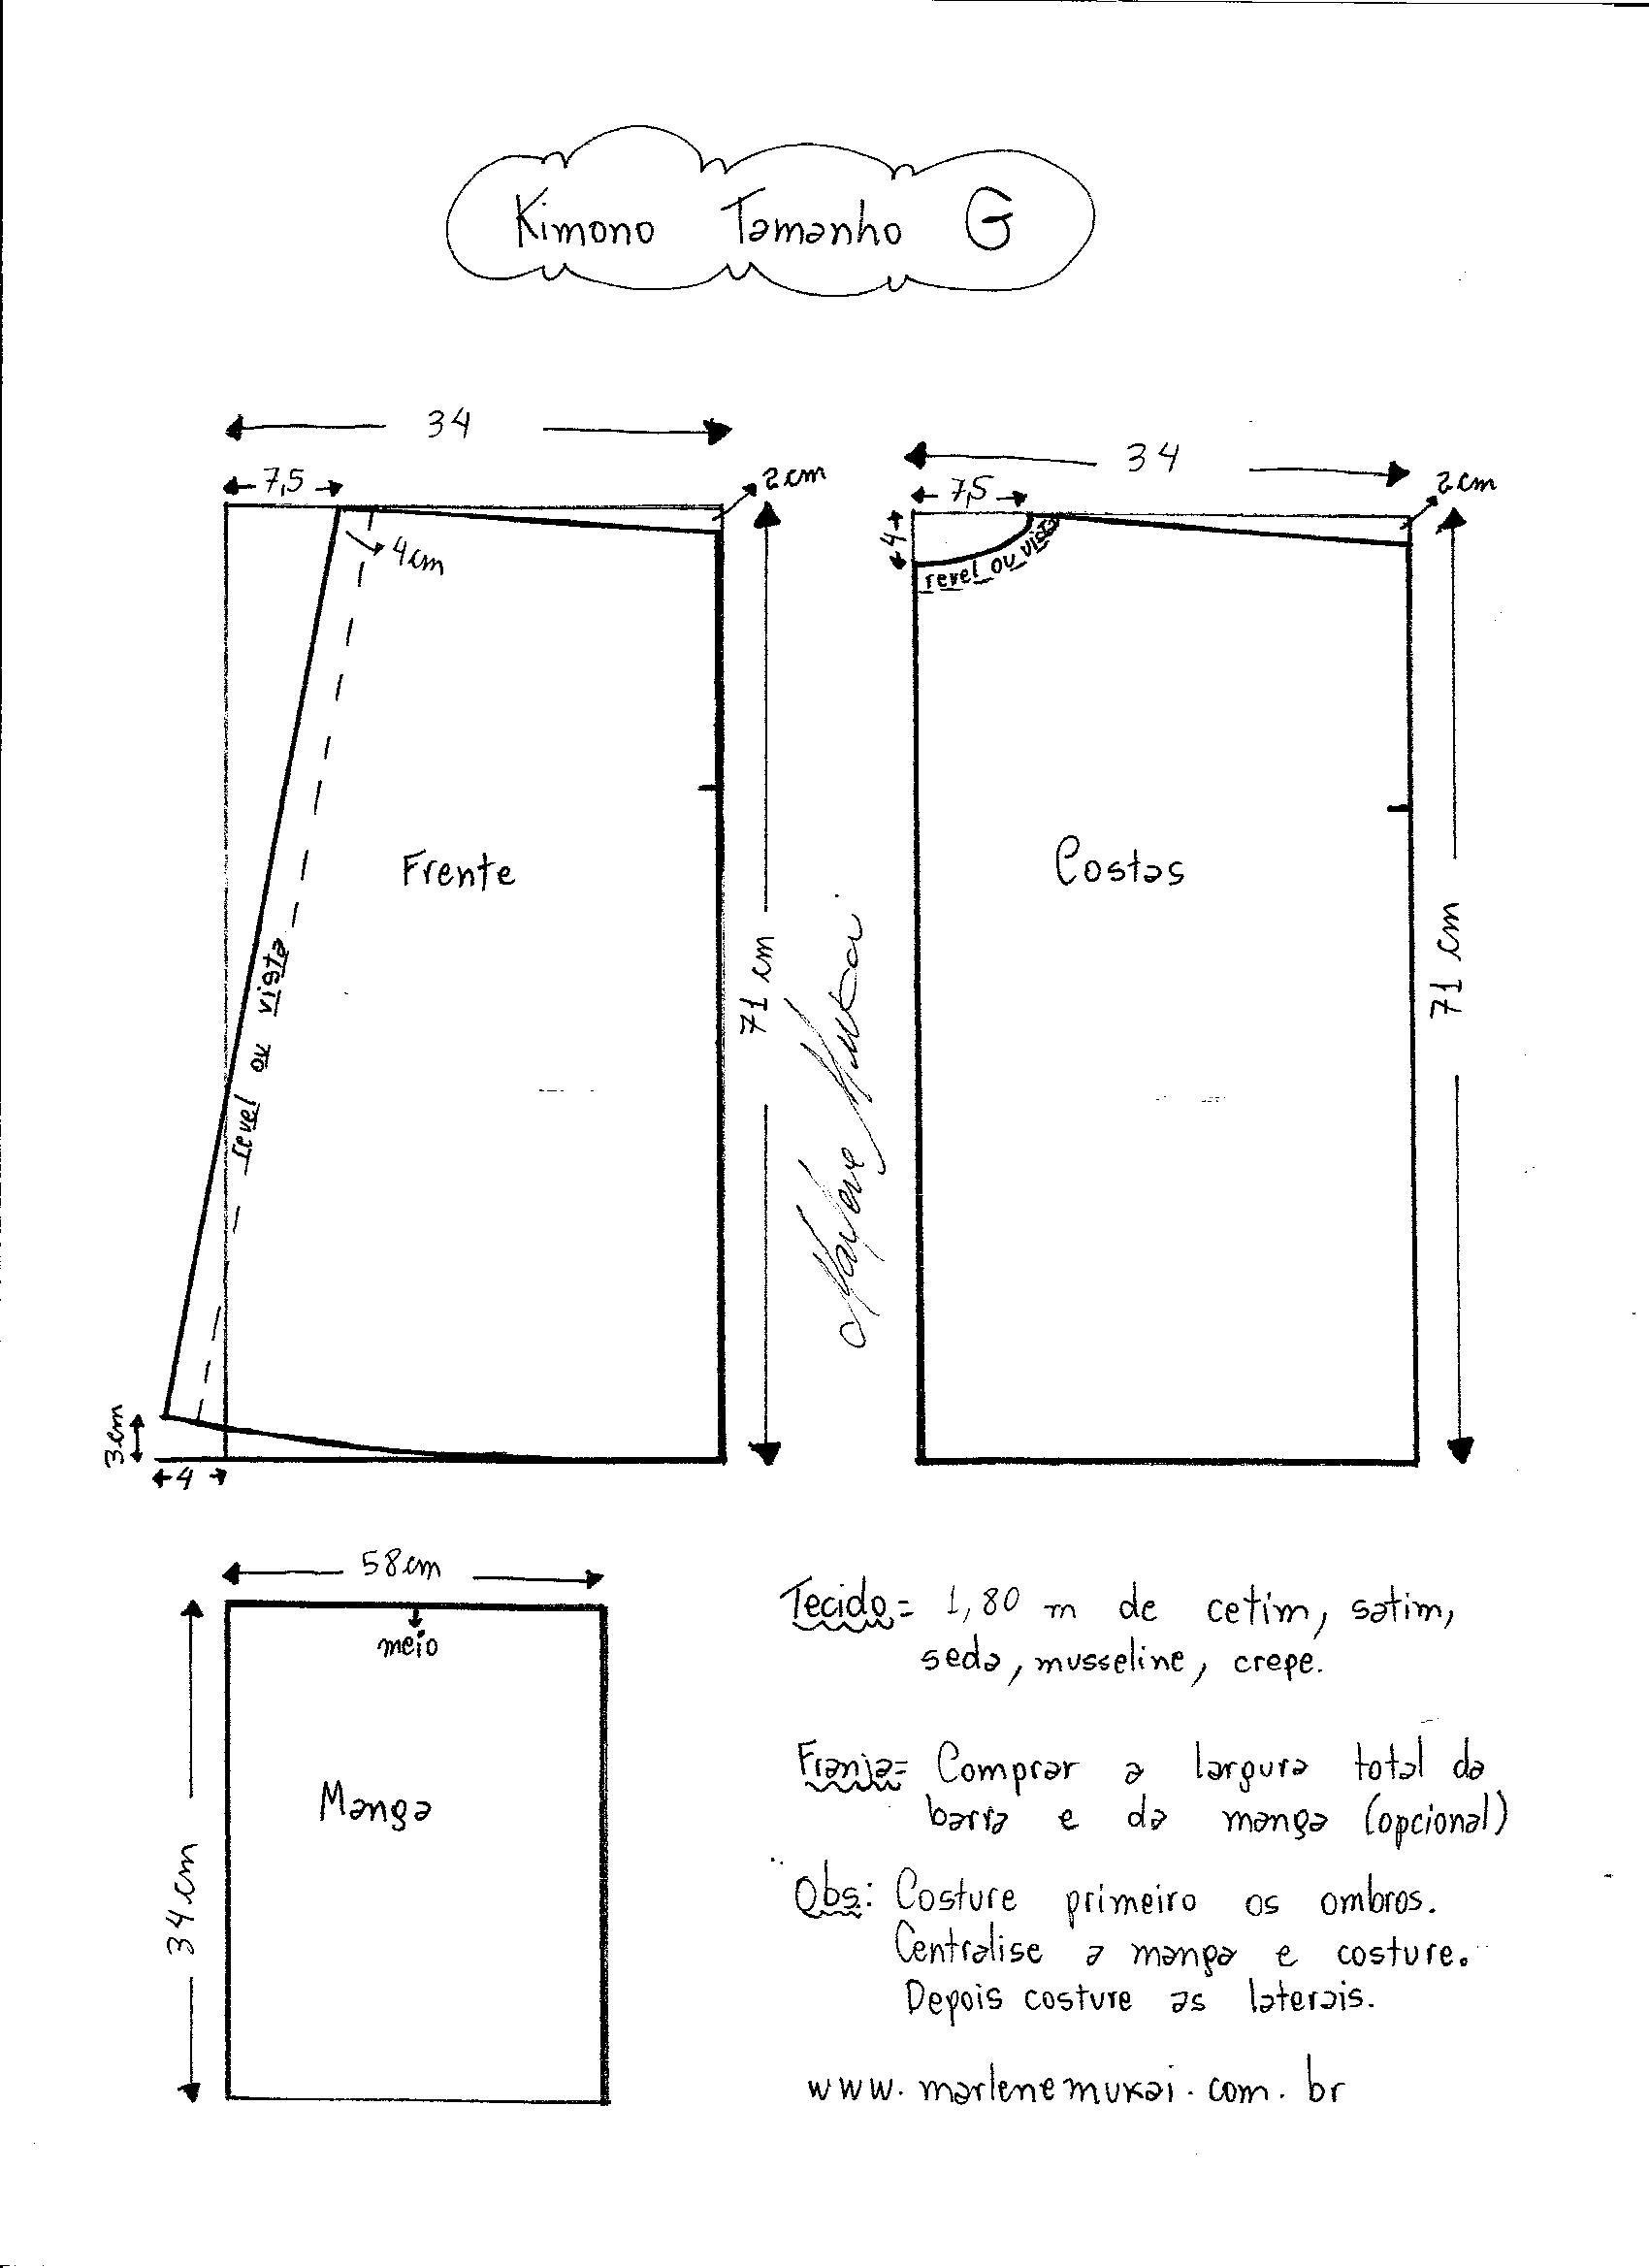 Pin de Tiani Lima en Sewing | Pinterest | Blusas y Costura